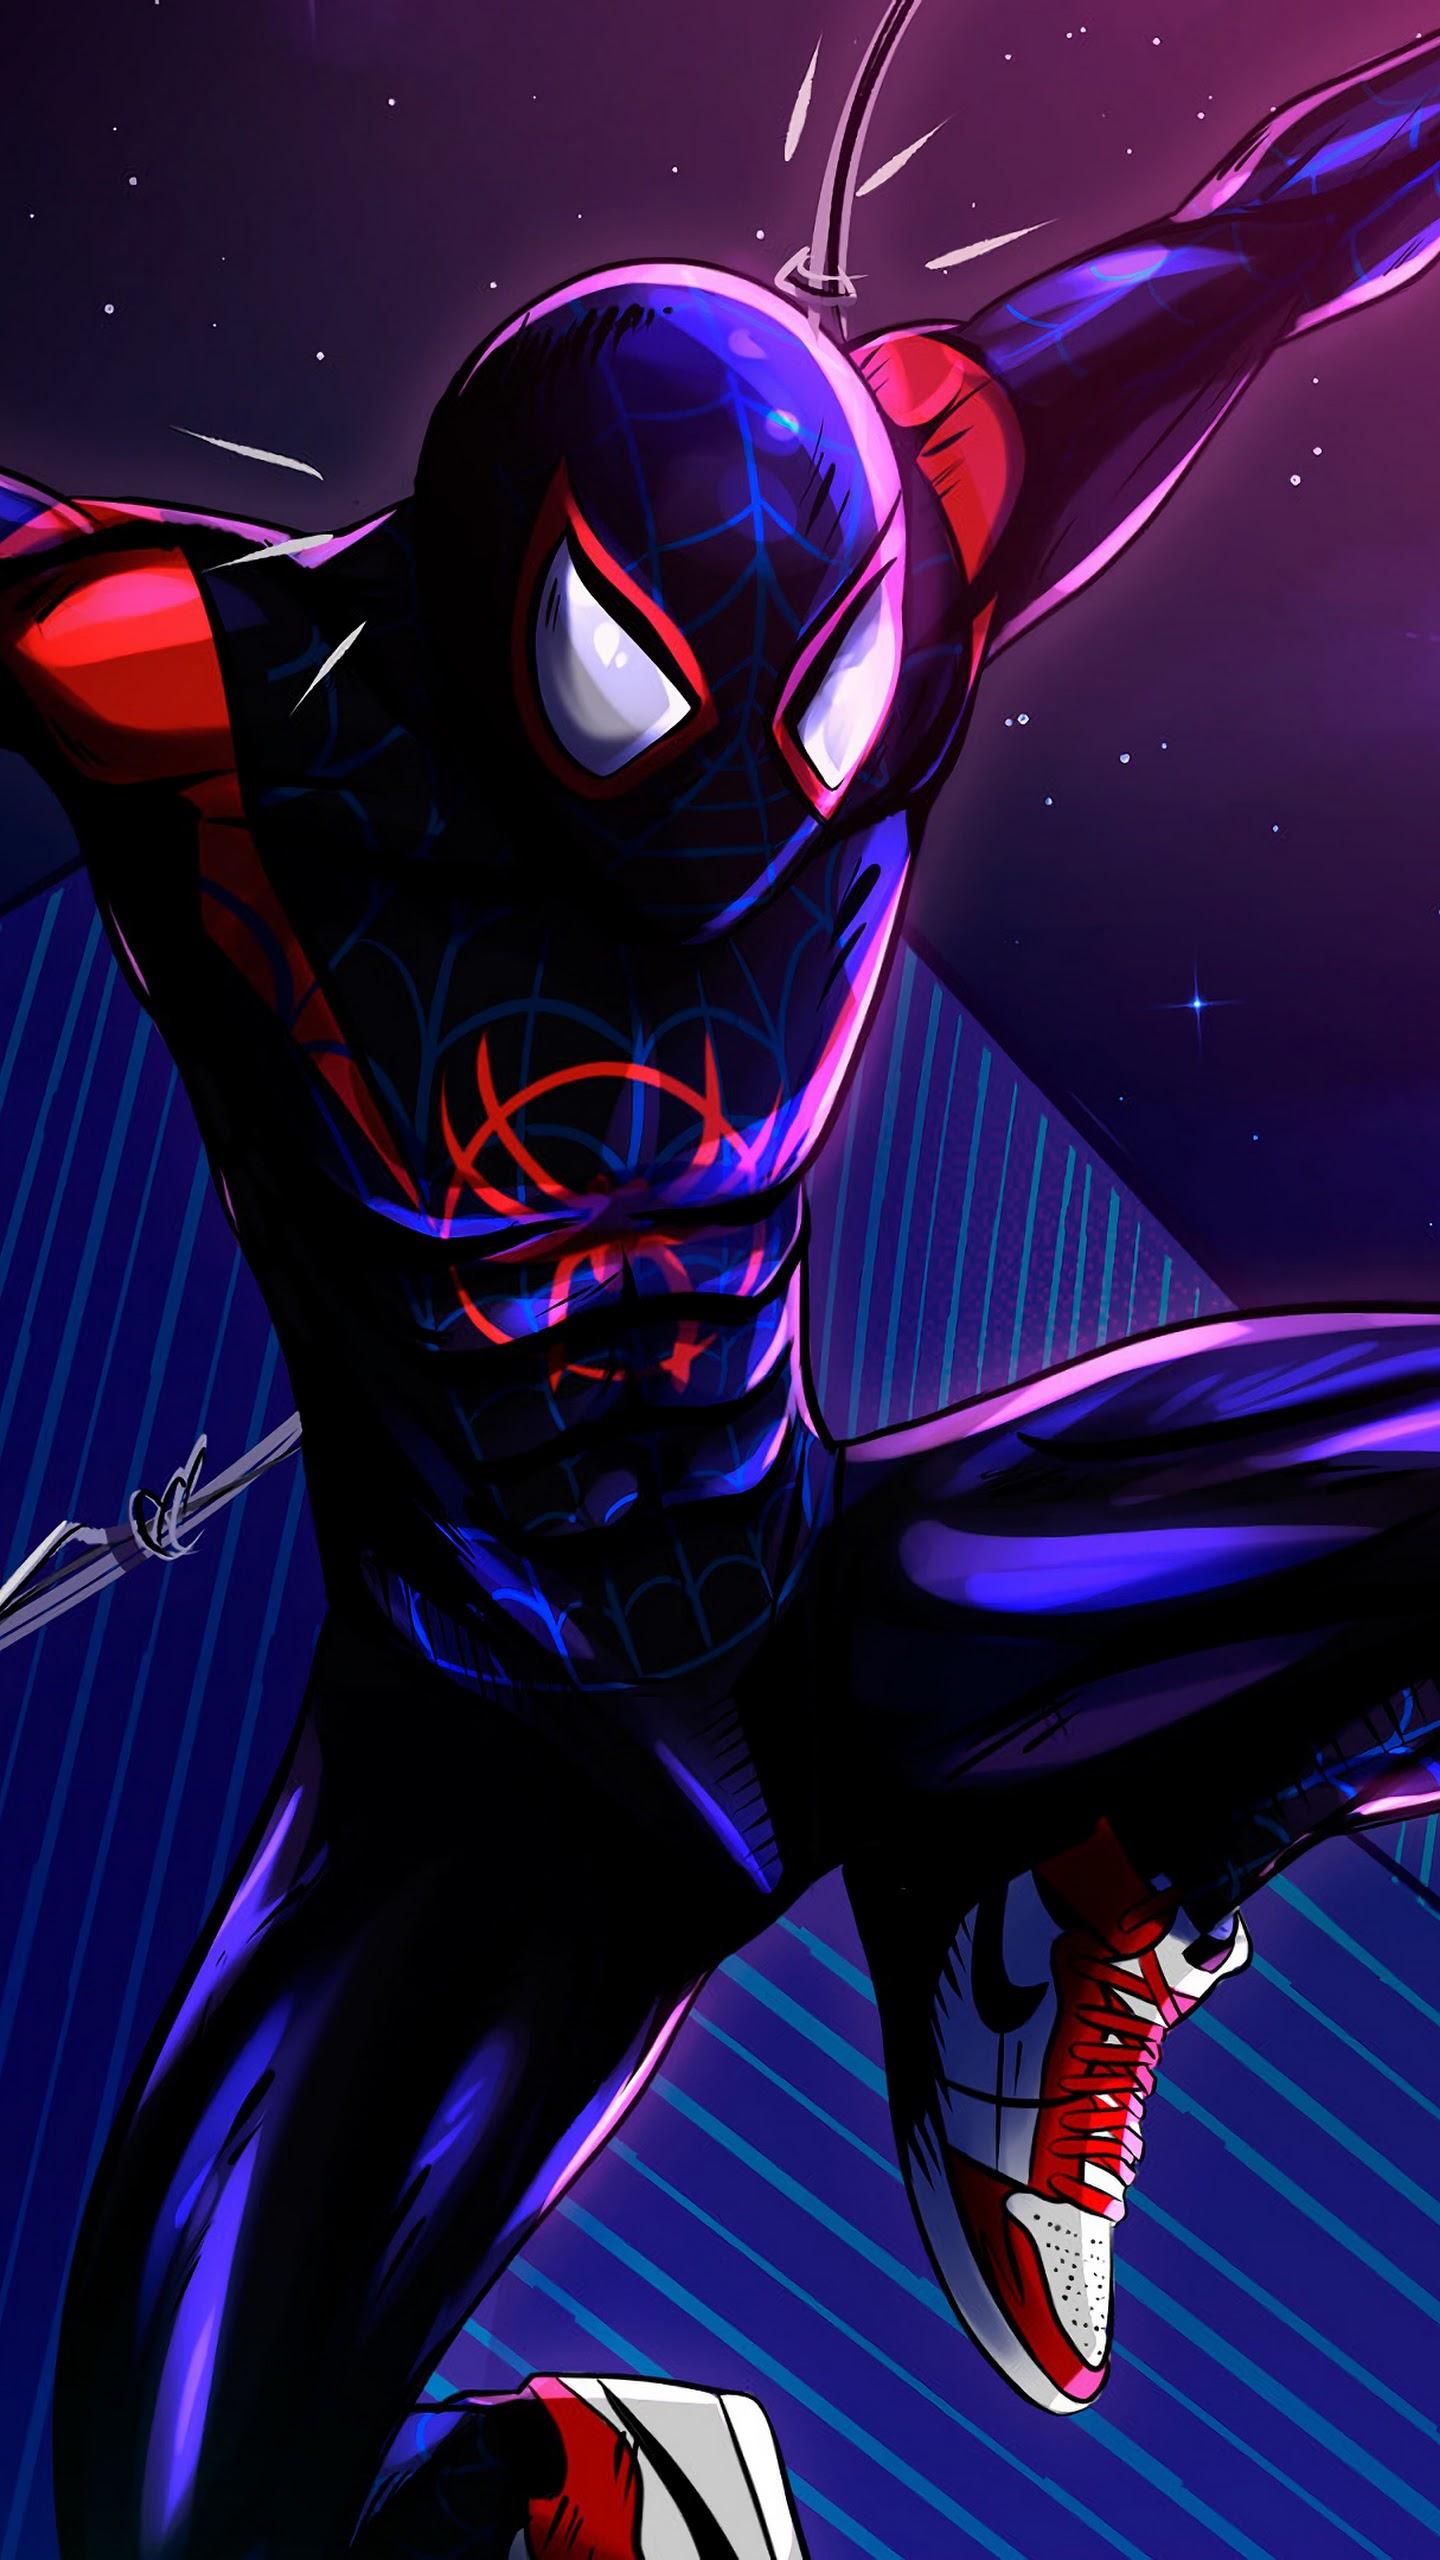 Miles Morales Spider Man Into The Spider Verse 4k Wallpaper 20